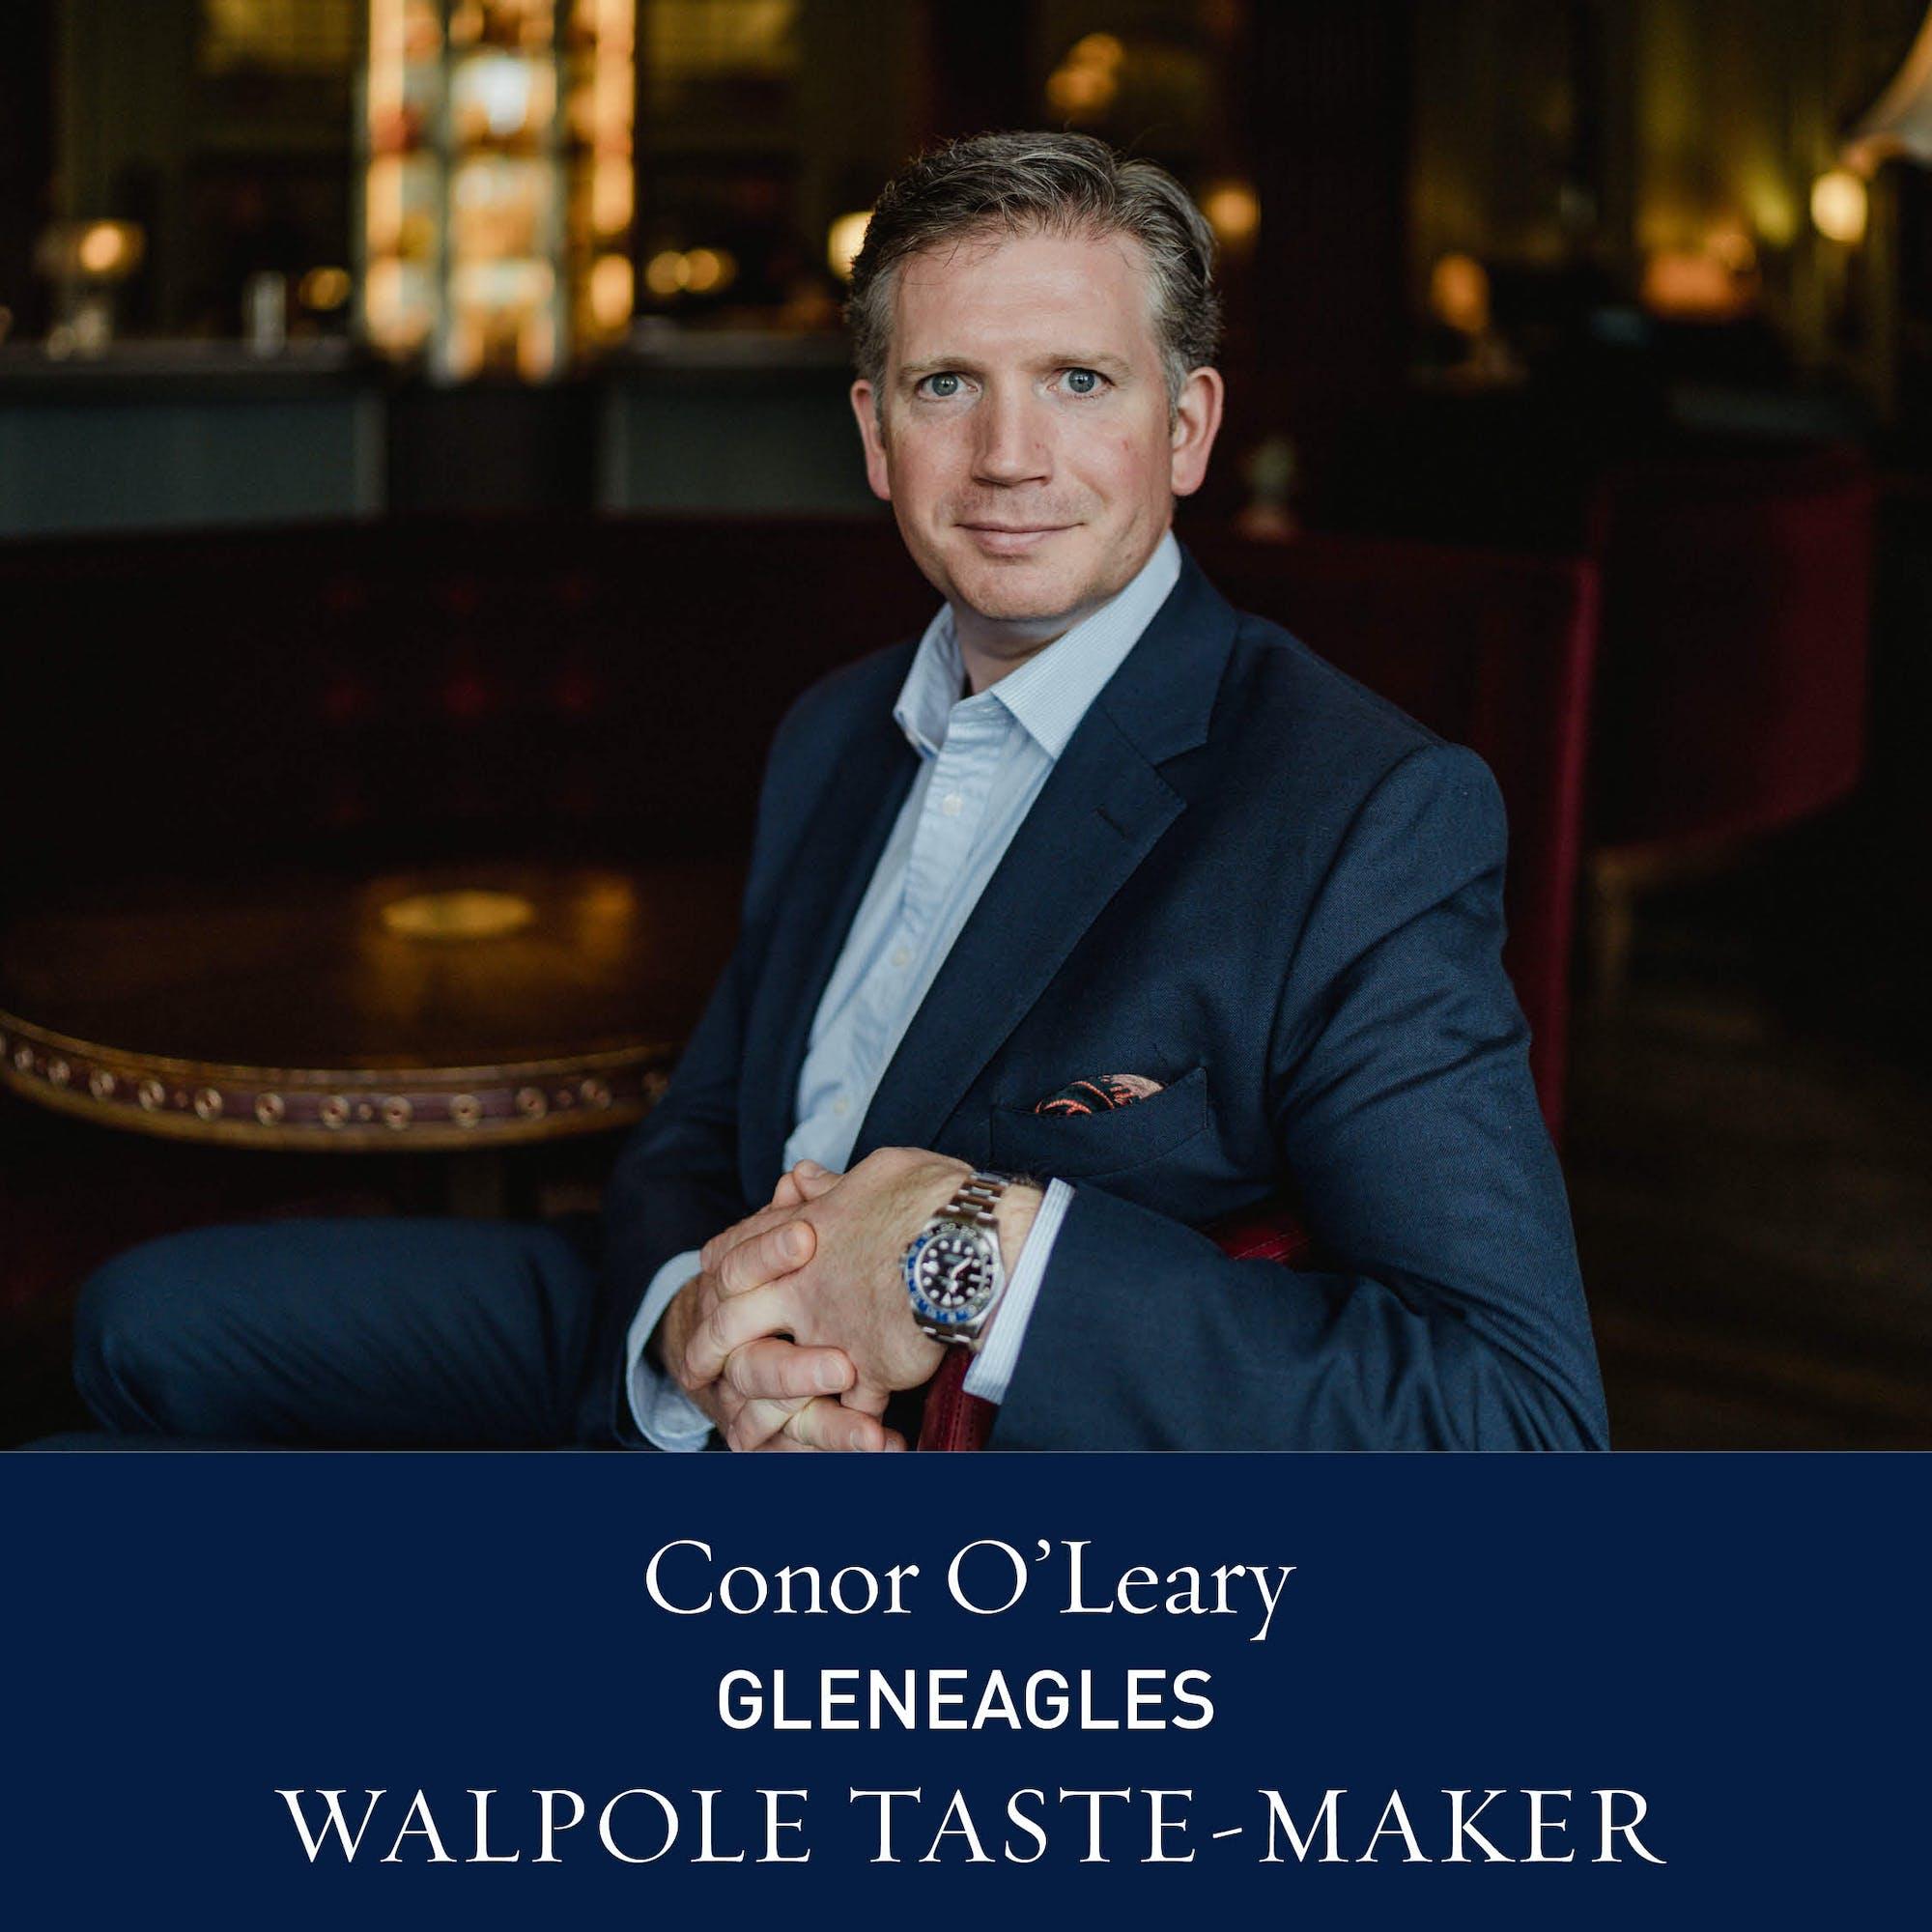 The Walpole Power List 2020  The Taste-Makers: Conor O'Leary, Gleneagles